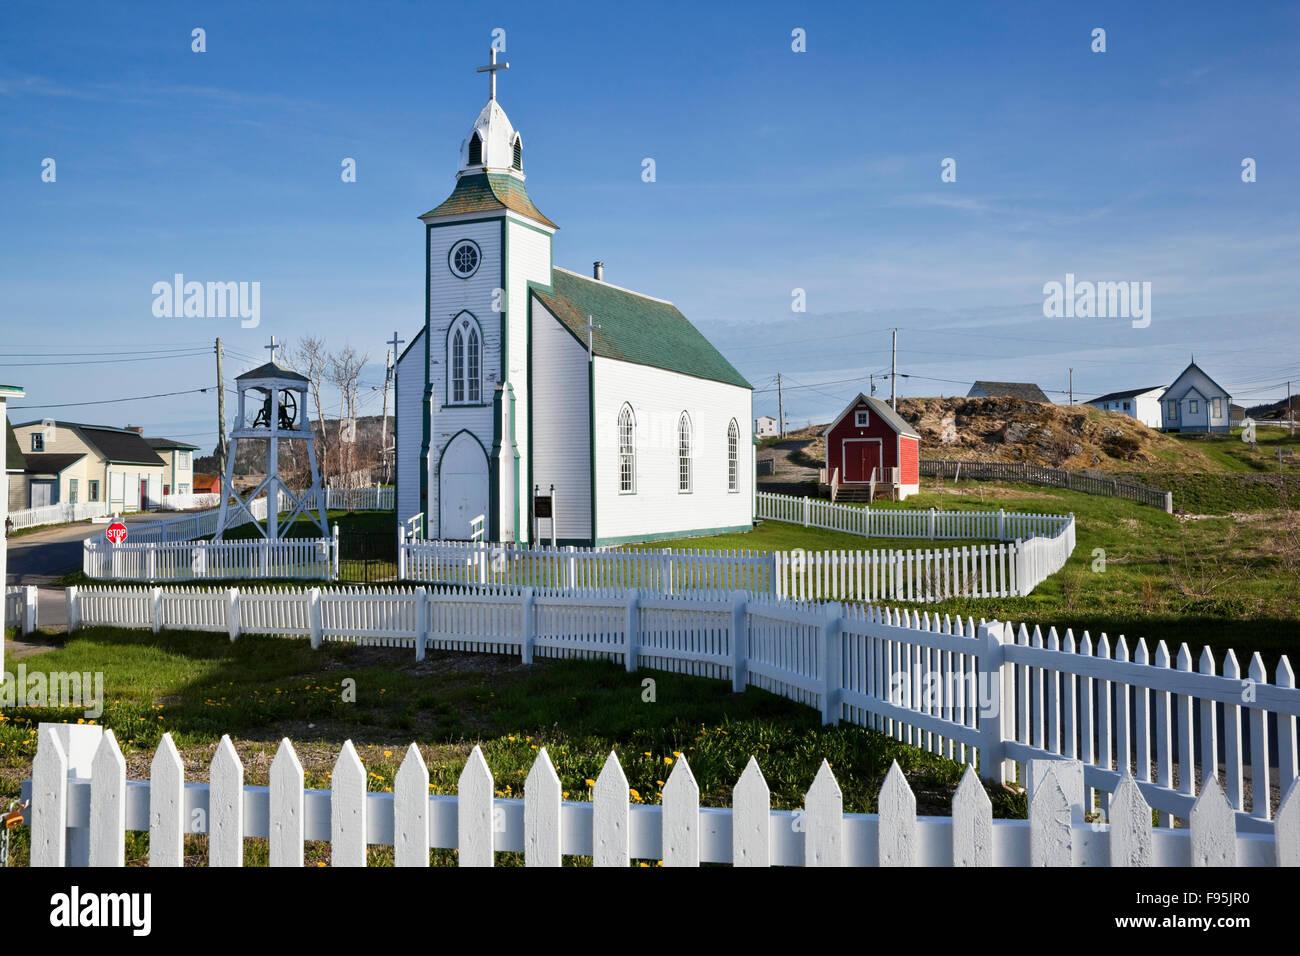 Holy Trinity Roman Catholic Church surrounded on all sides by white picket fences. Trinity, Newfoundland - Stock Image